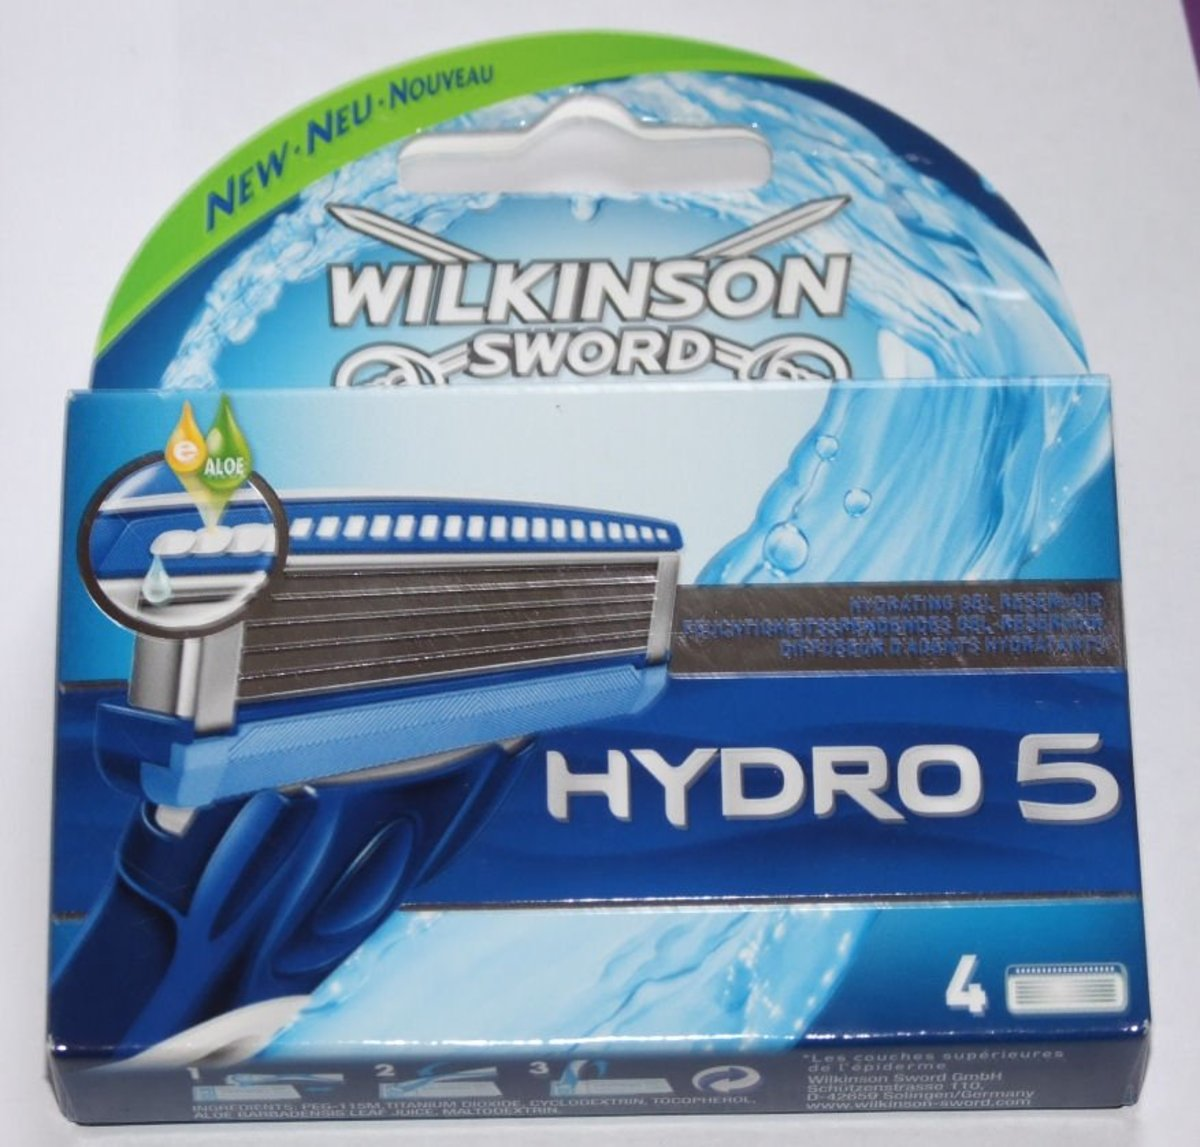 Wilkinsons Sword Hydro 5 Review - Vs the Quattro and Gillette Fusion